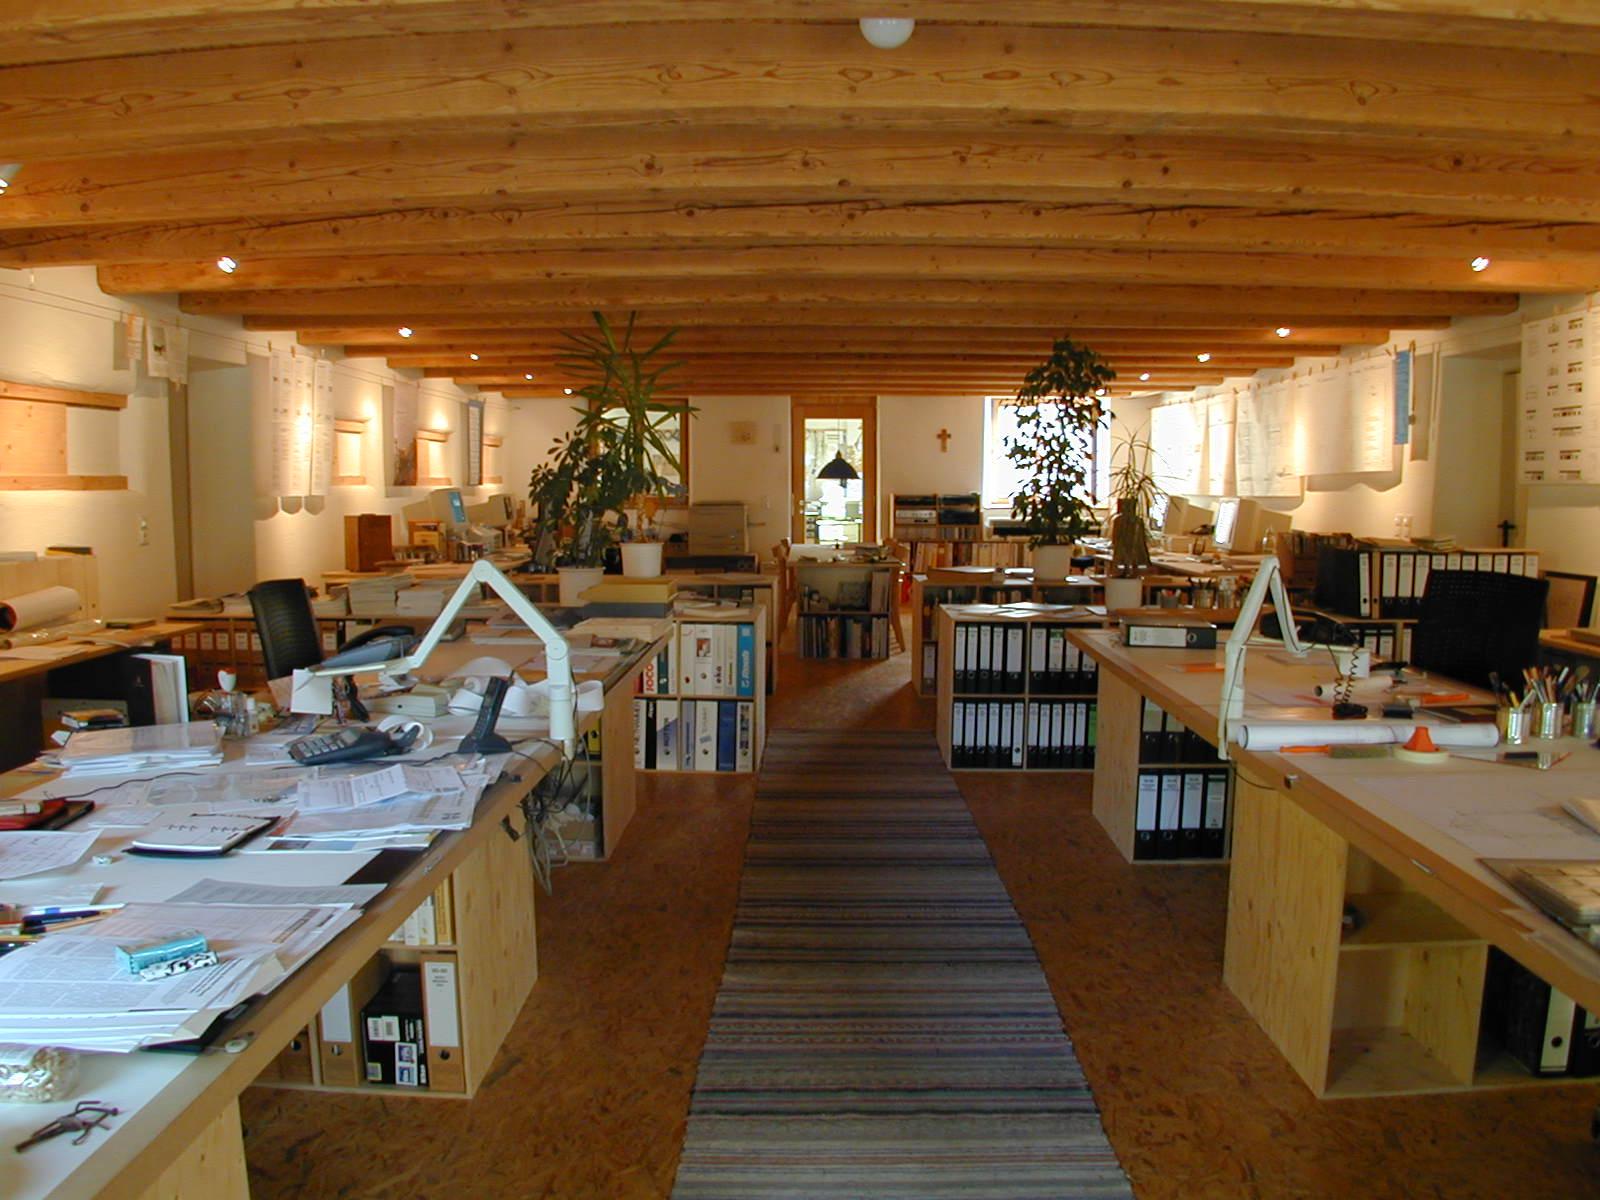 Architekturbüro innen architekturbüro